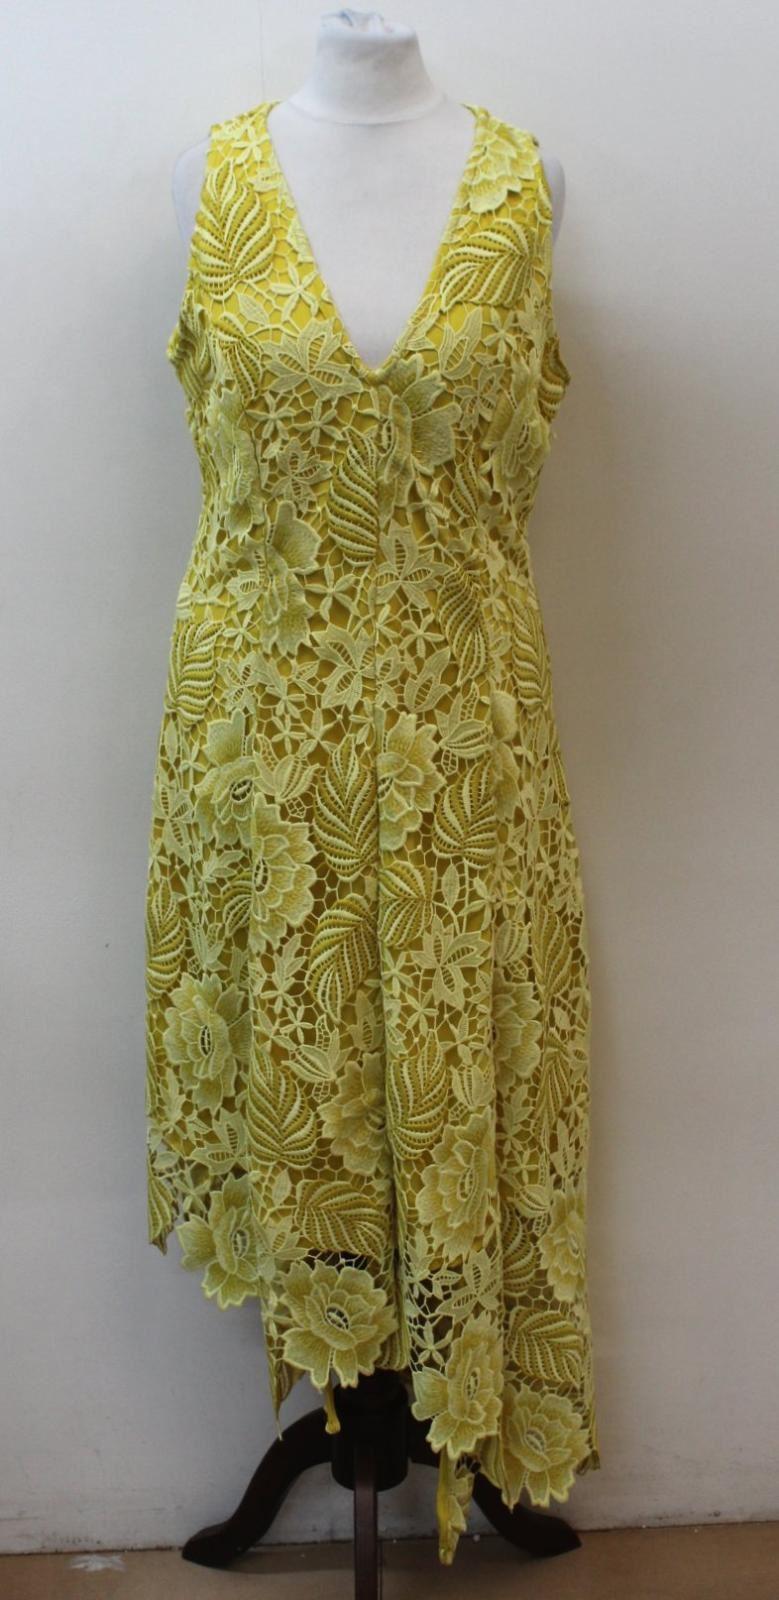 AUTOGRAPH Ladies Gelb Floral Crochet Asymmetric Hem Dress UK10 EU38 BNWT